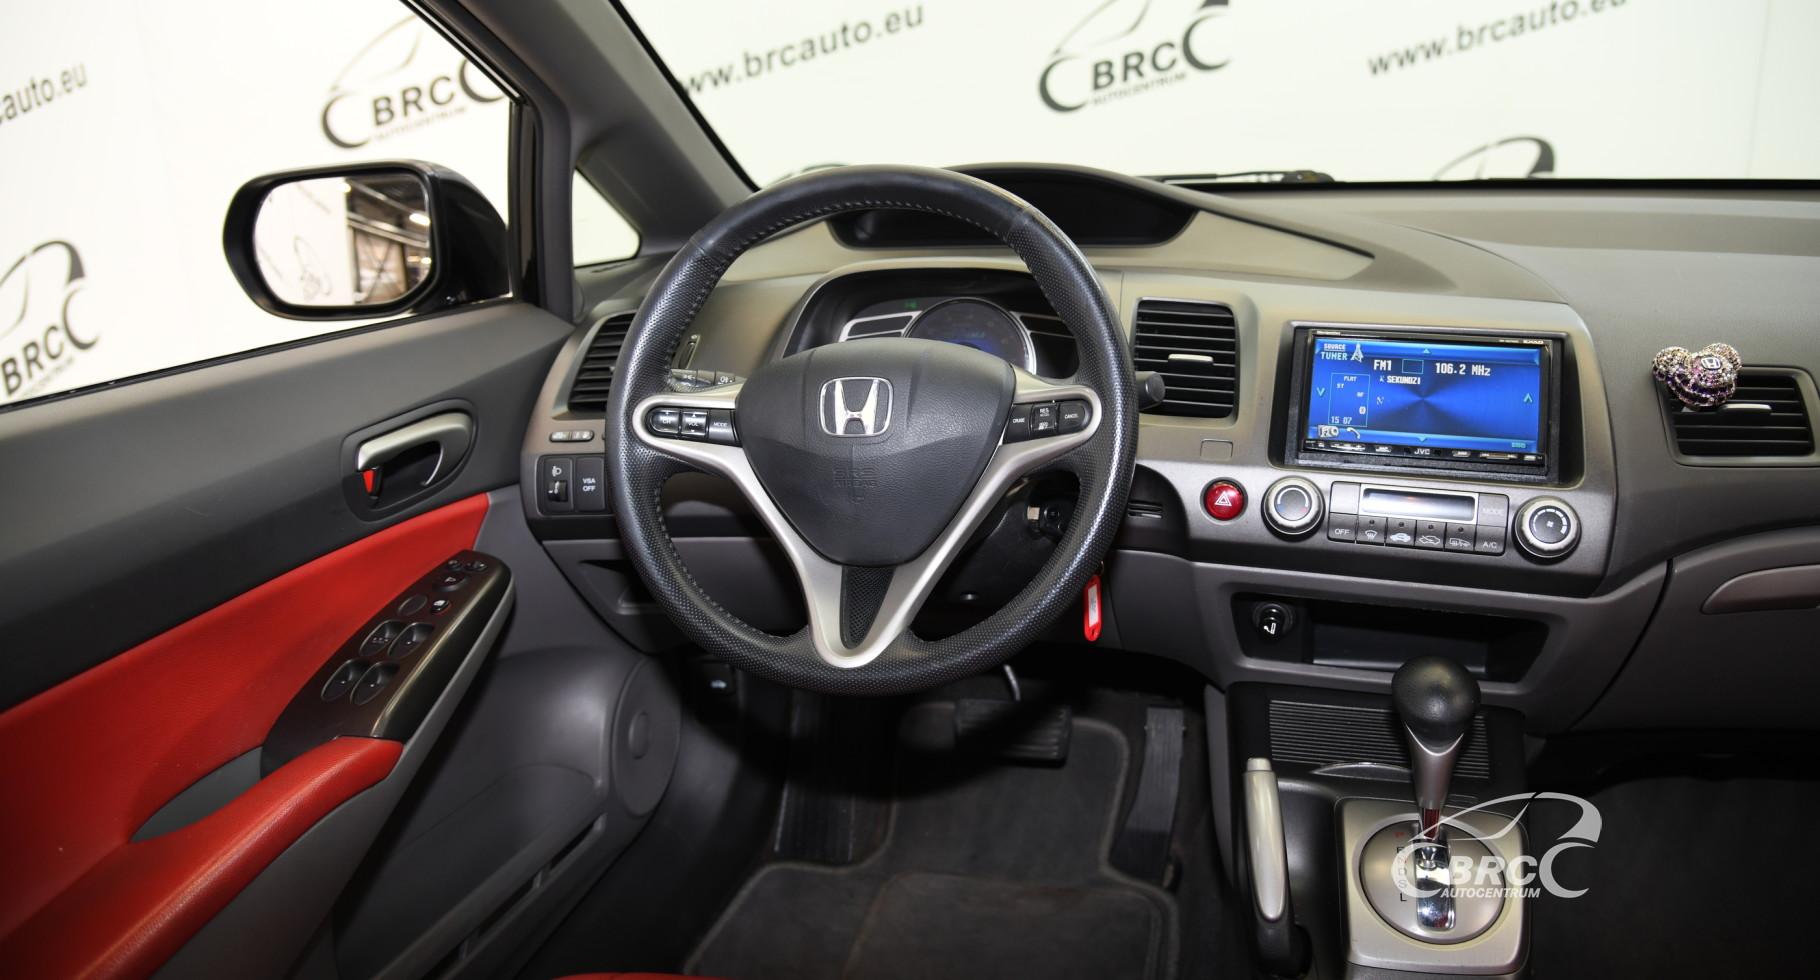 Honda Civic 1.3 Hybrid Automatas